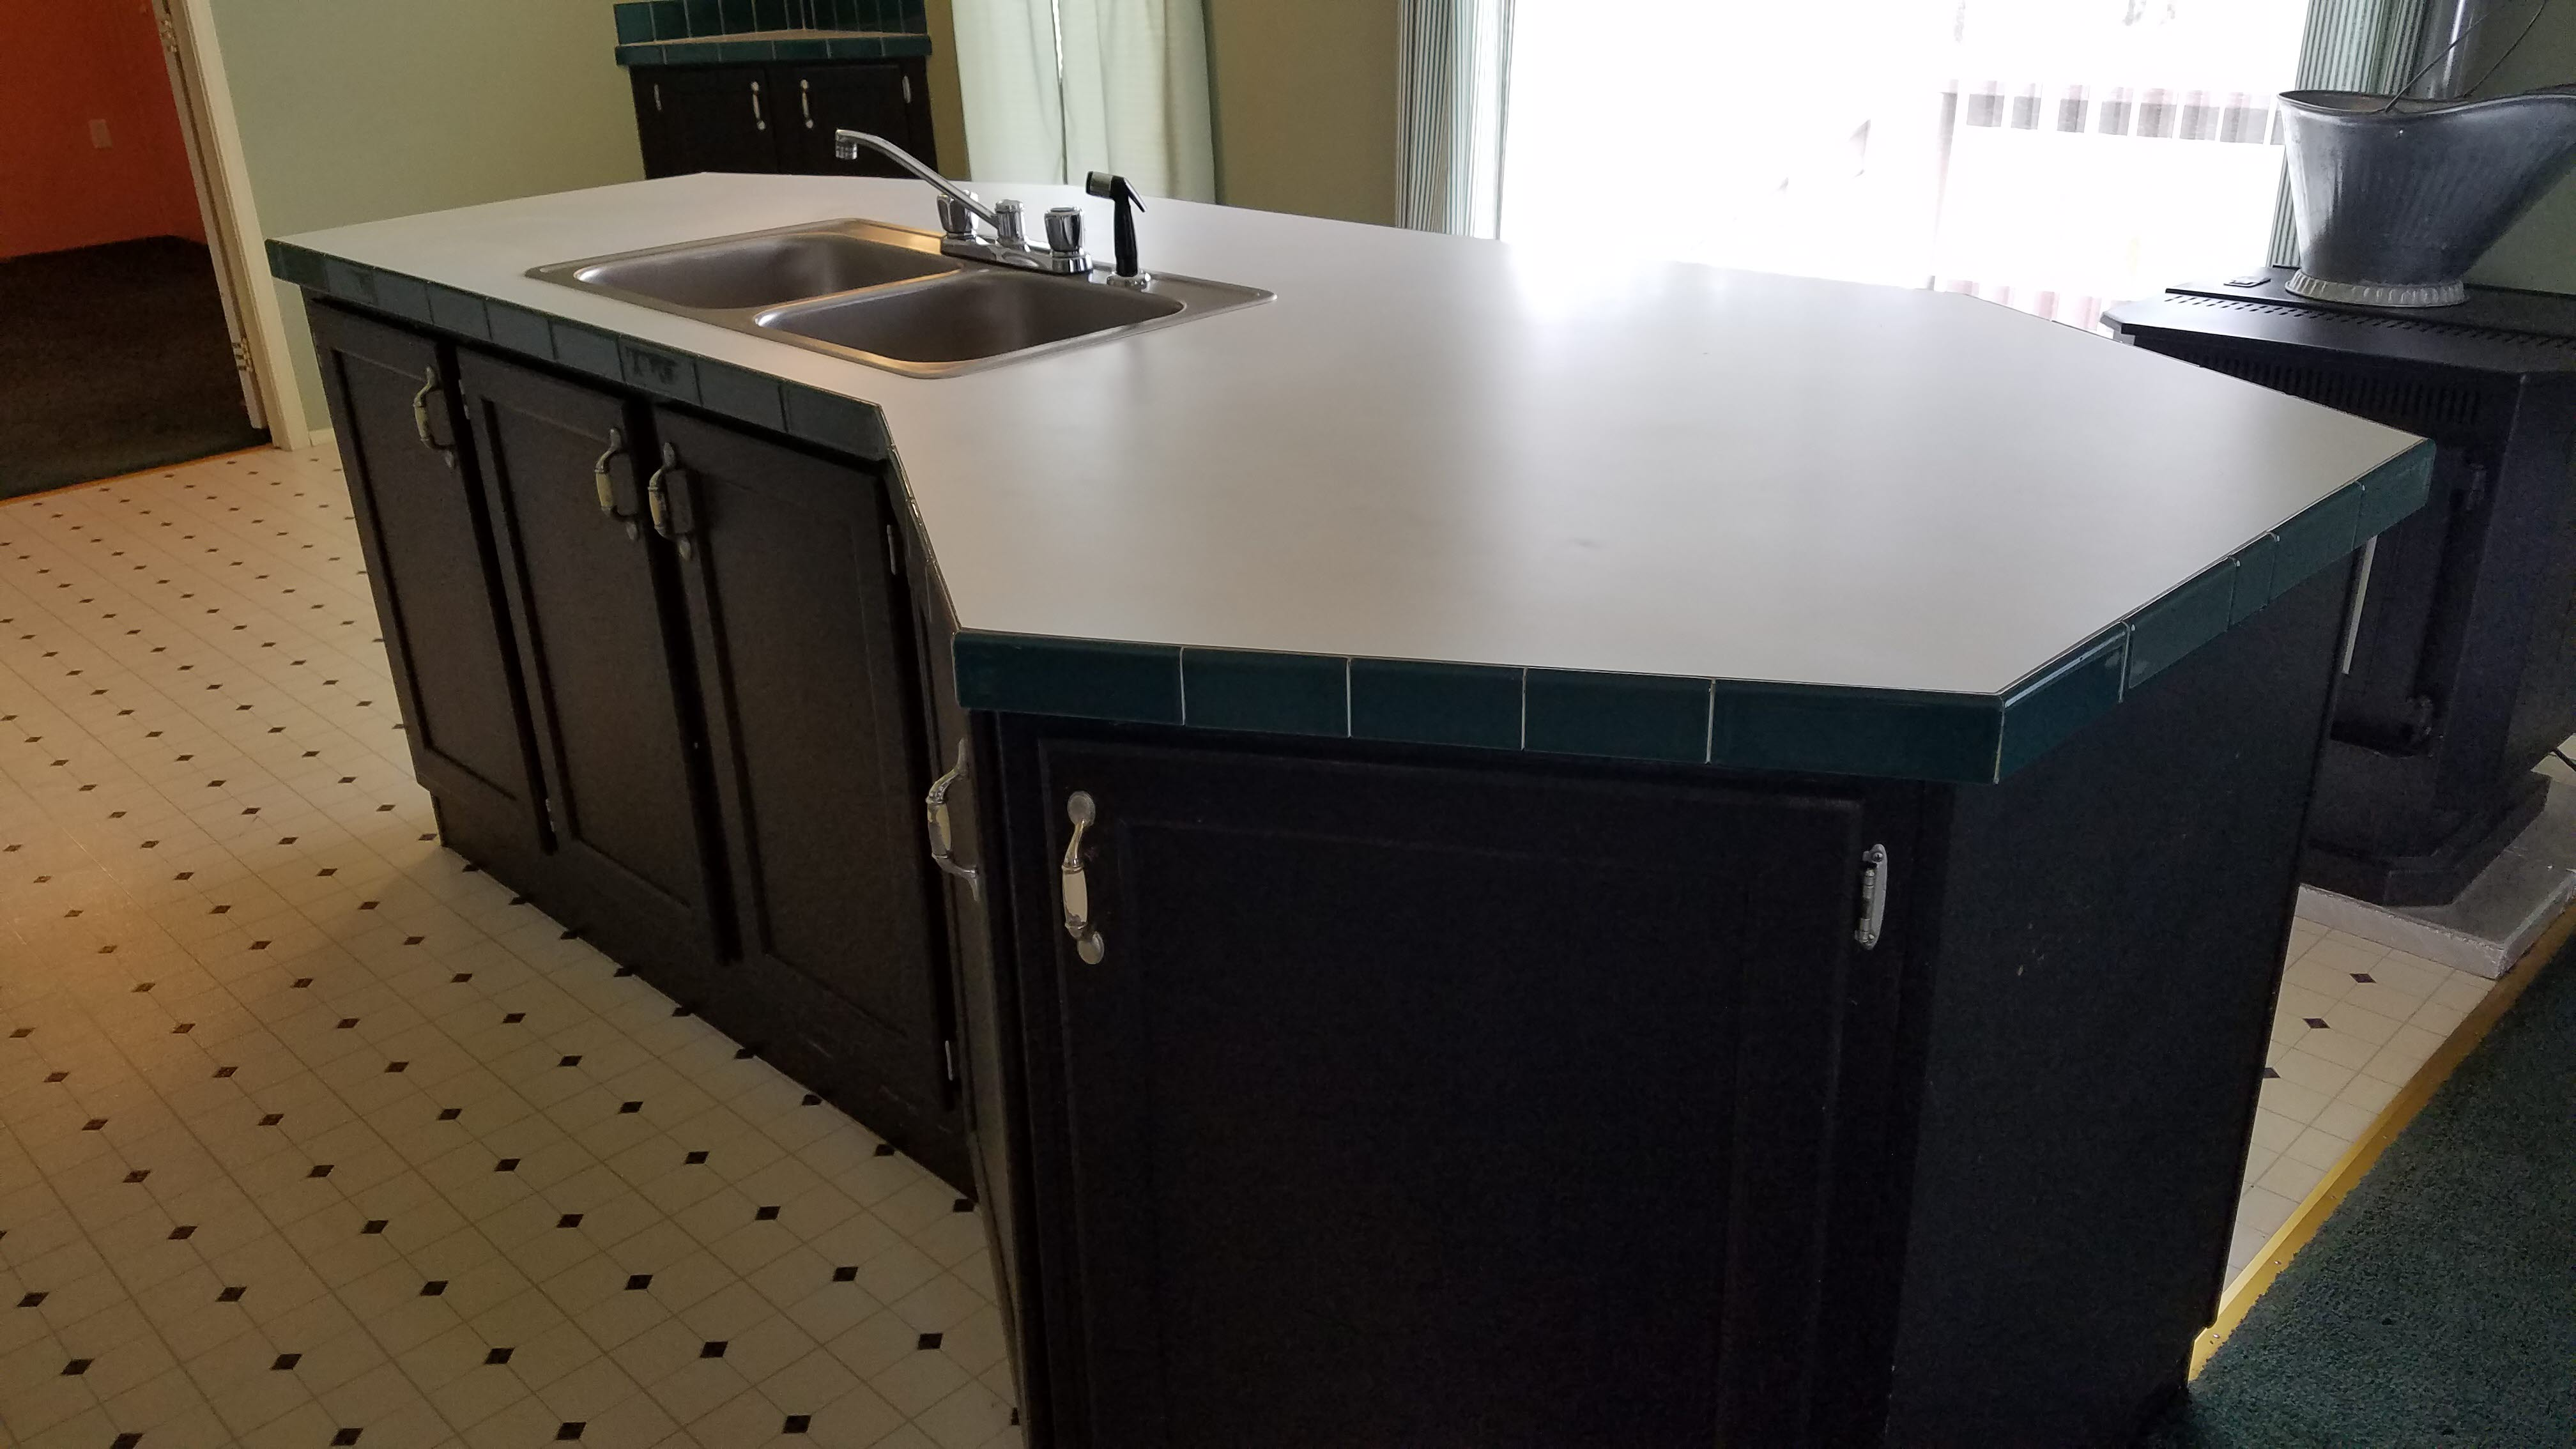 4x7 Kitchen Island 8x5 Kitchen Islands 8x4 Kitchen